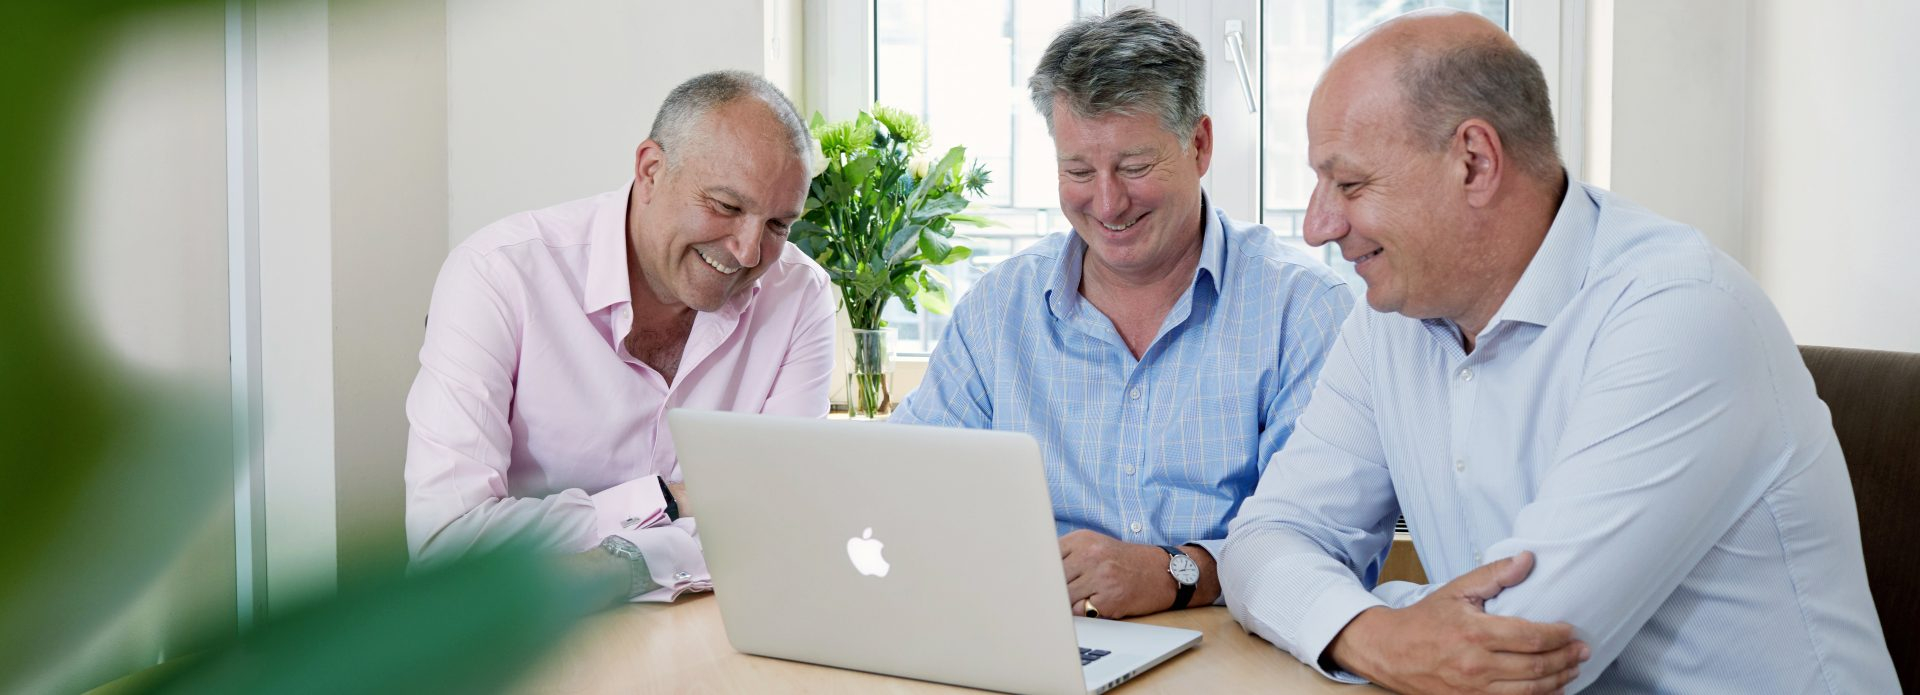 3 business men looking at laptop